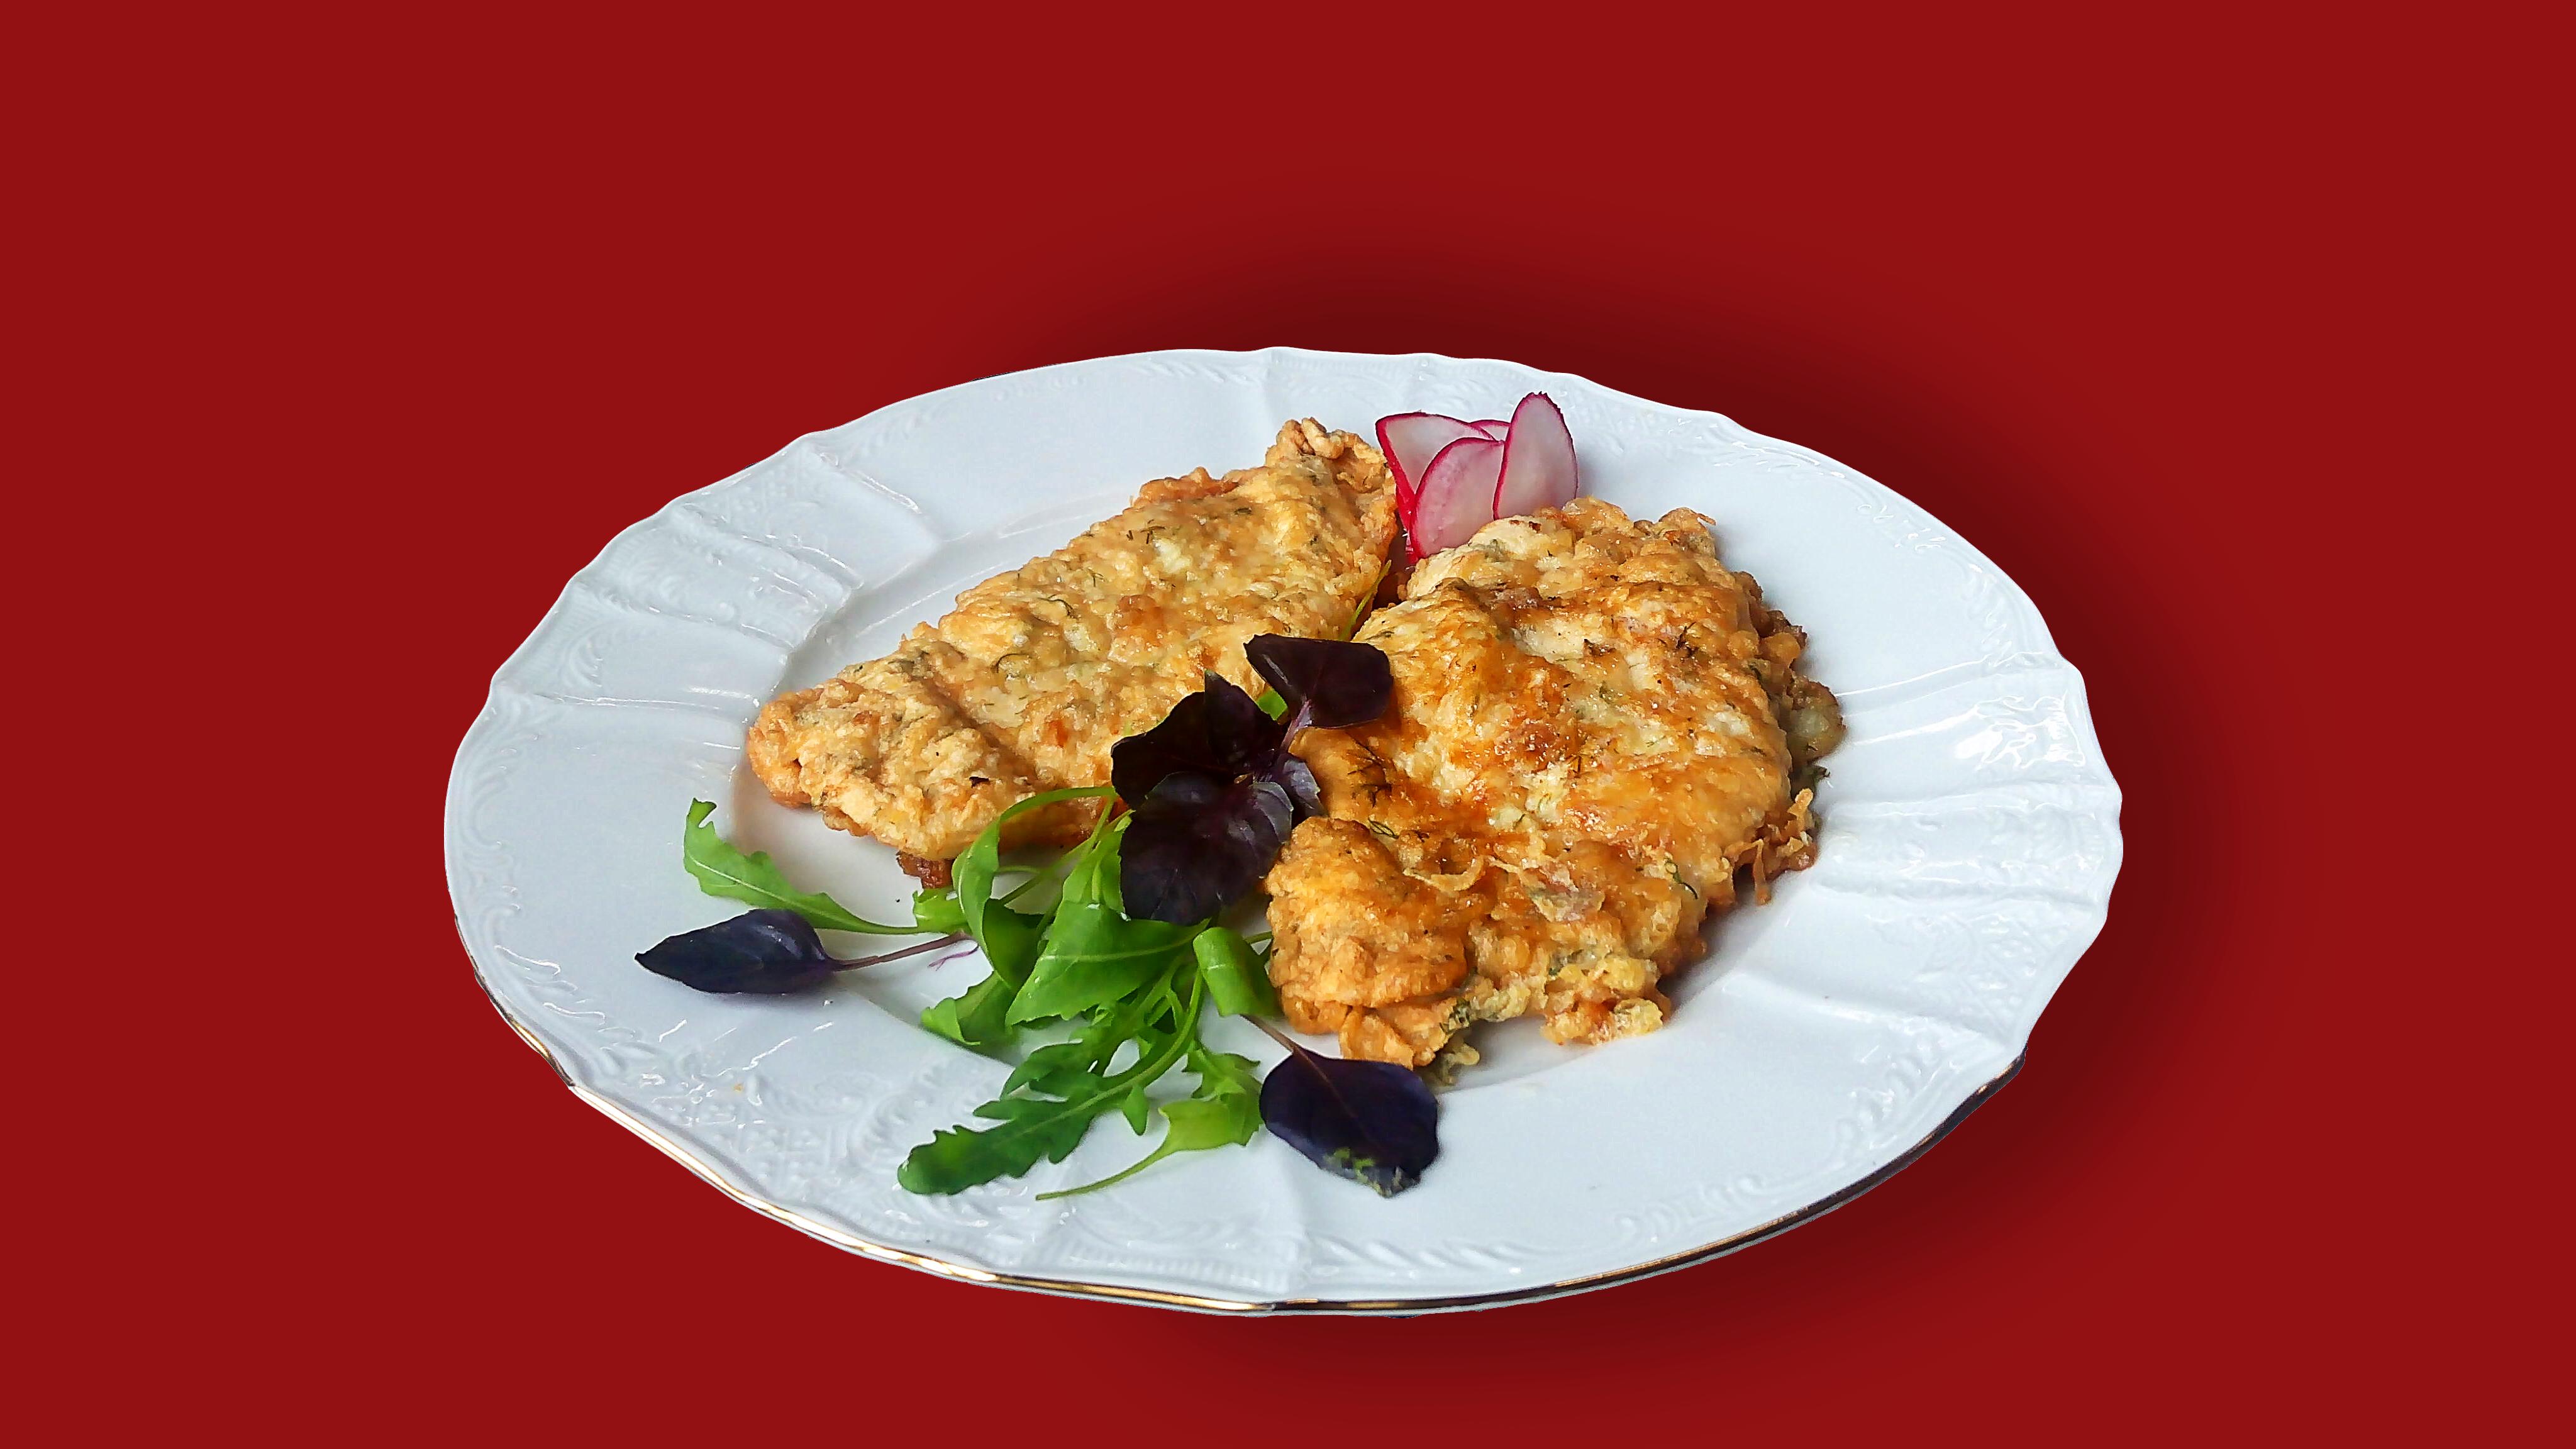 Курица по-арабски. Пошаговый рецепт с фото. Видео 19